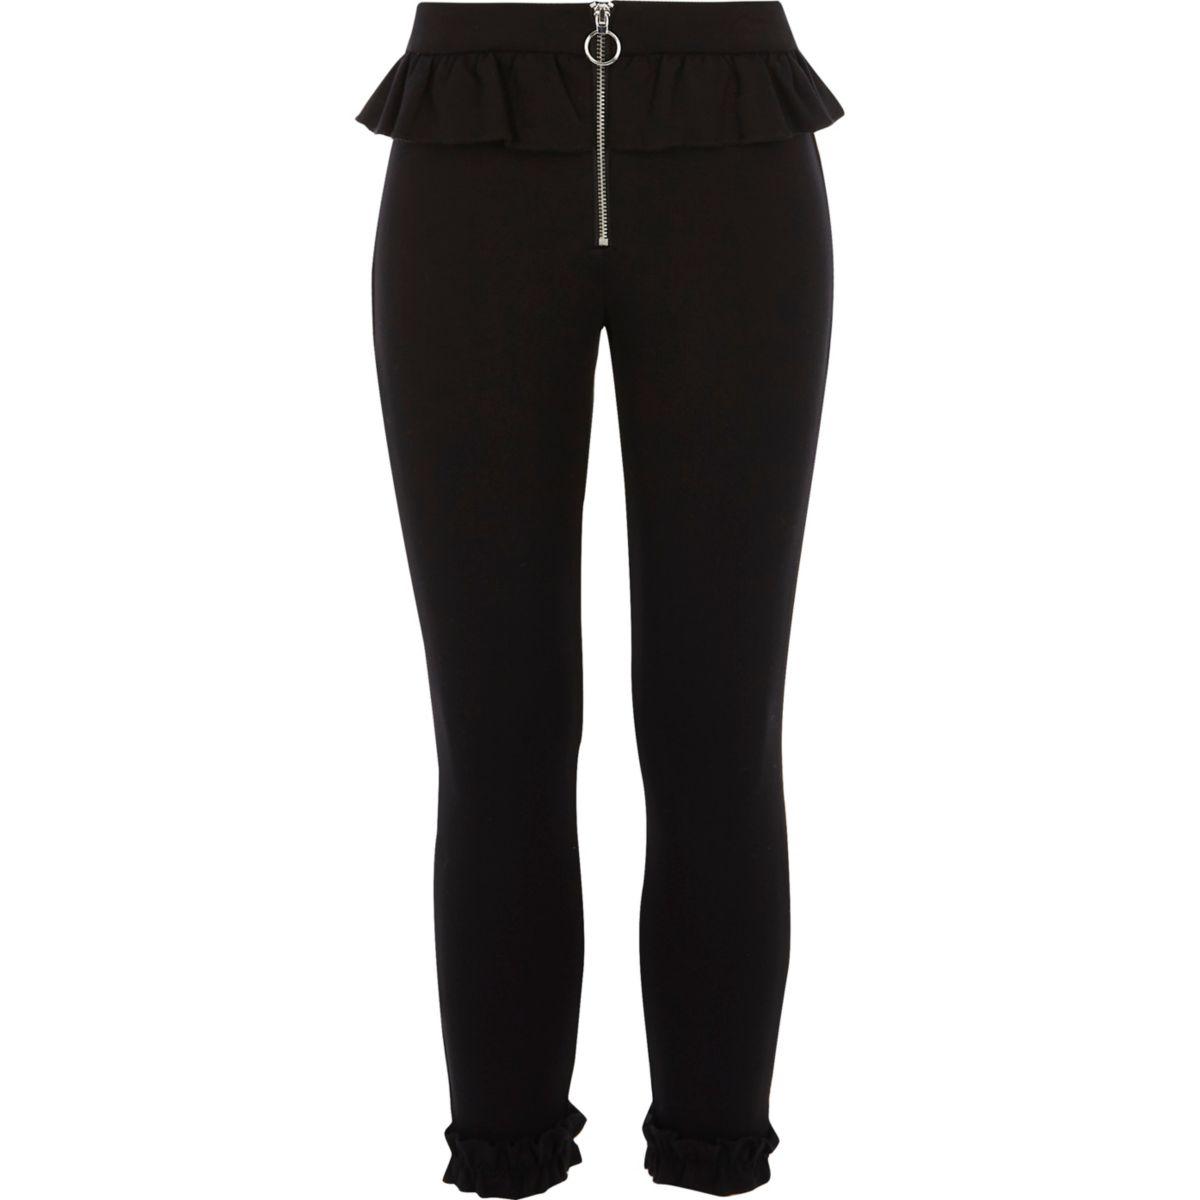 Girls black frill zip cigarette trousers